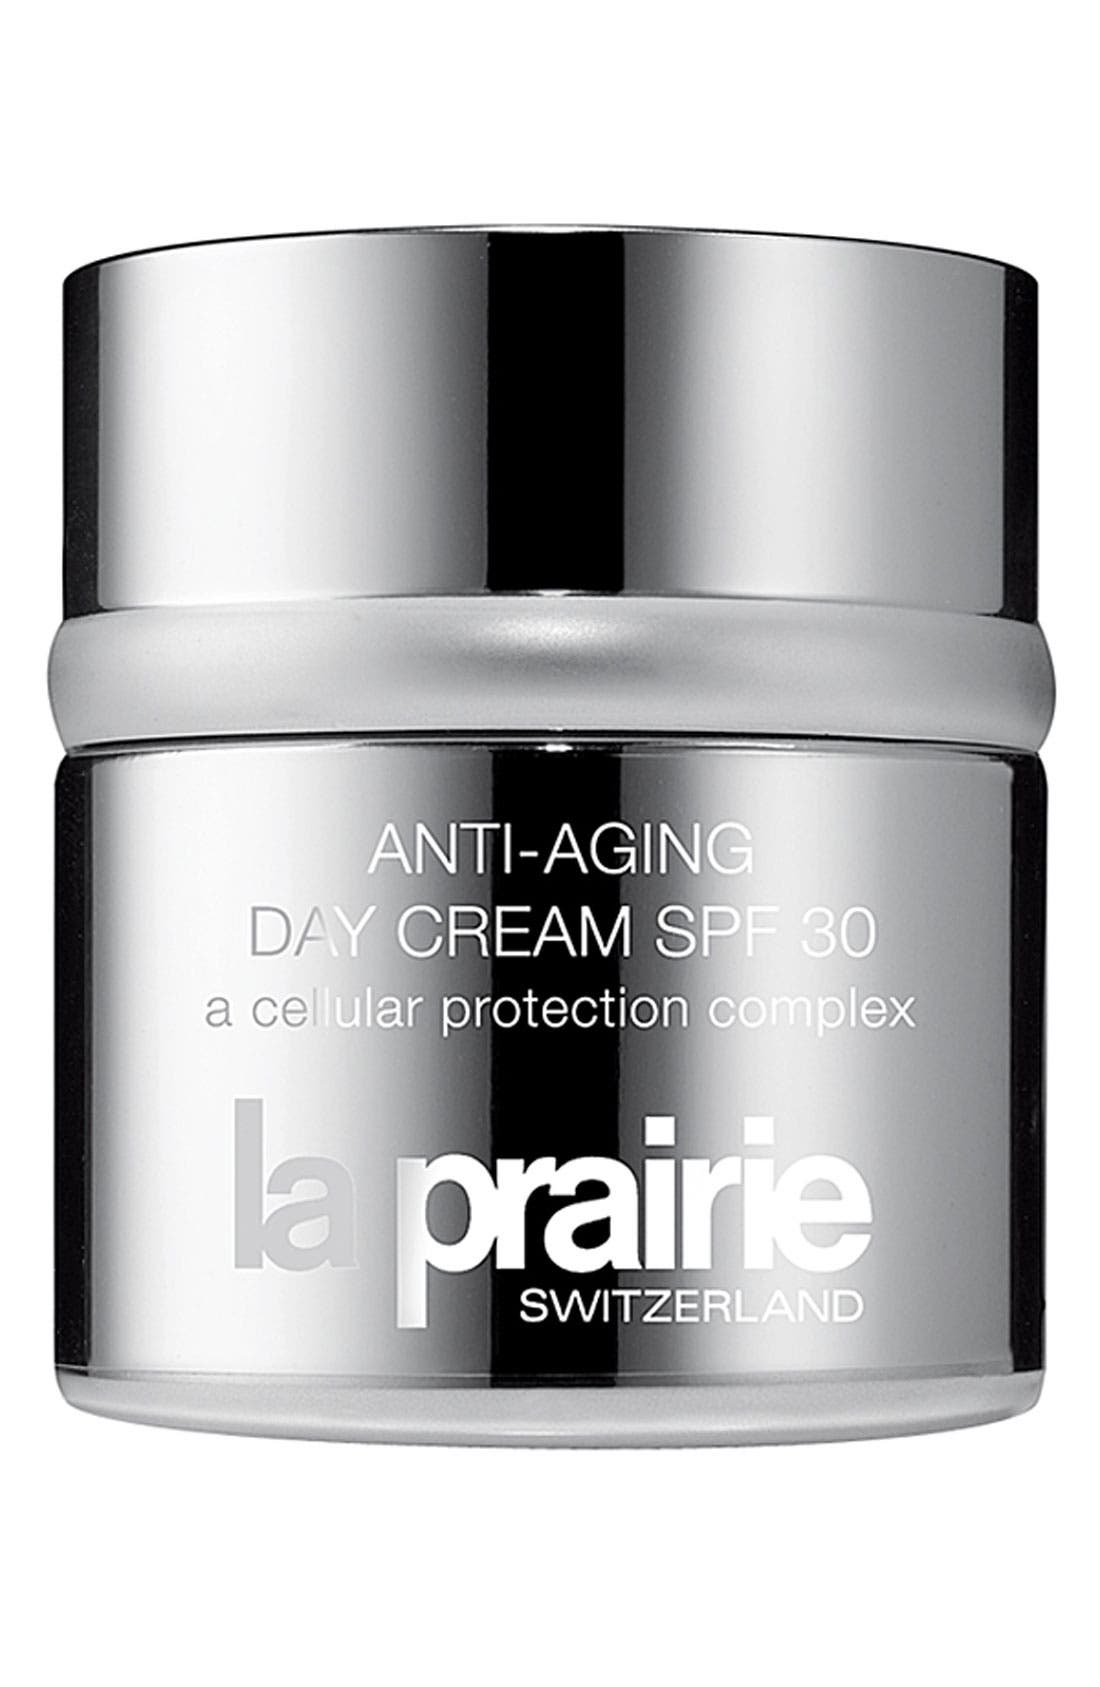 Anti-Aging Day Cream Sunscreen Broad Spectrum SPF 30,                         Main,                         color, NO COLOR